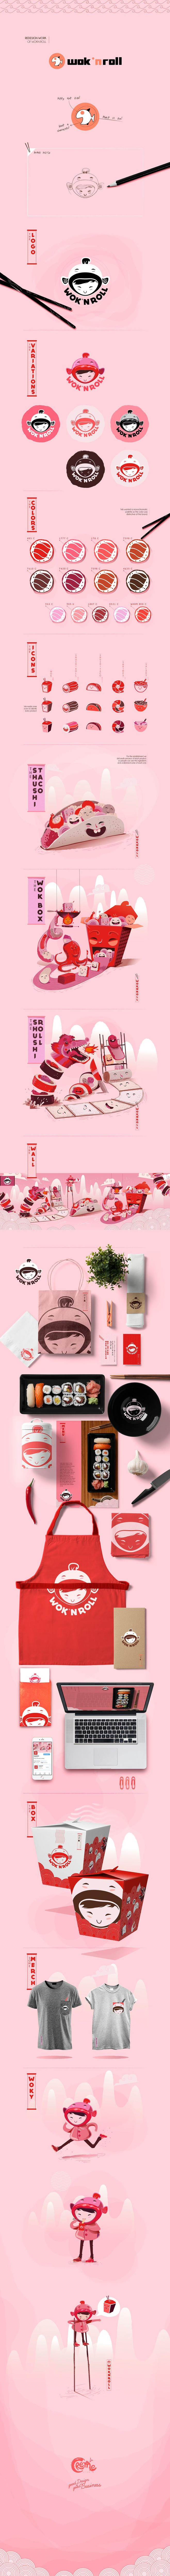 WokN`Roll • Brand Project on Behance